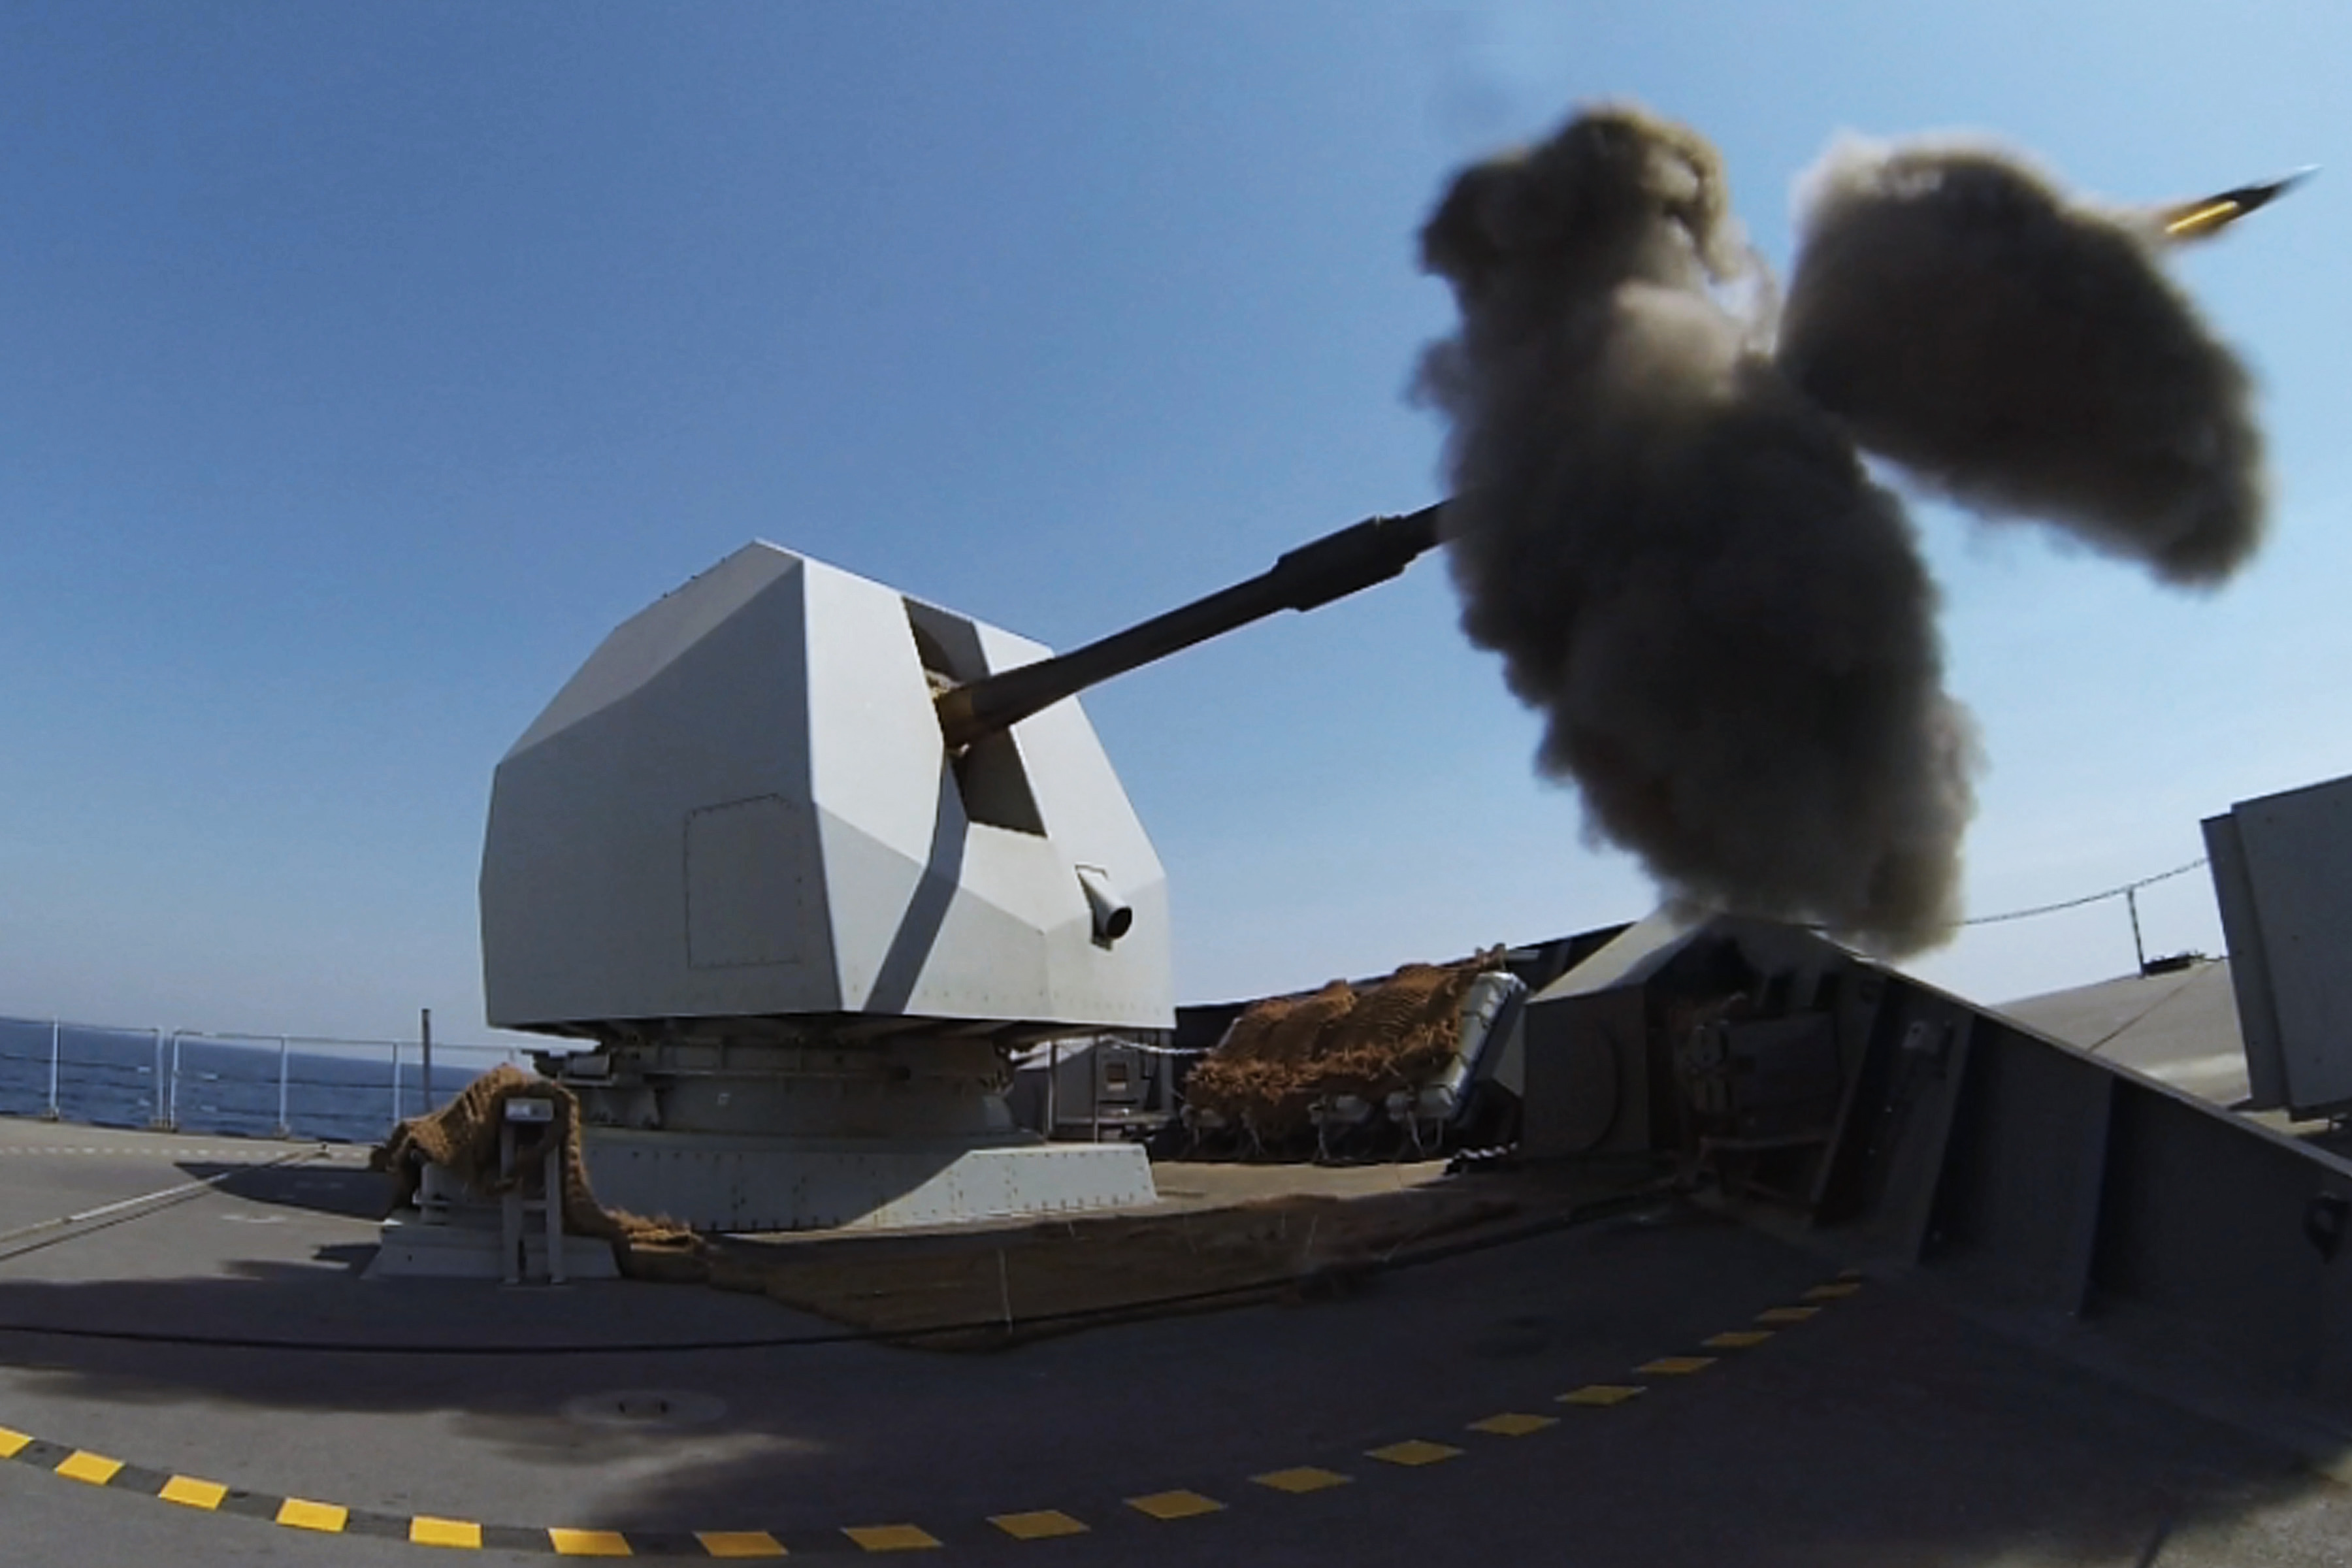 HMS_DEFENDER_fires_her_4.5_inch_Mk_8_Mod_1_naval_gun_MOD_45157963.jpg